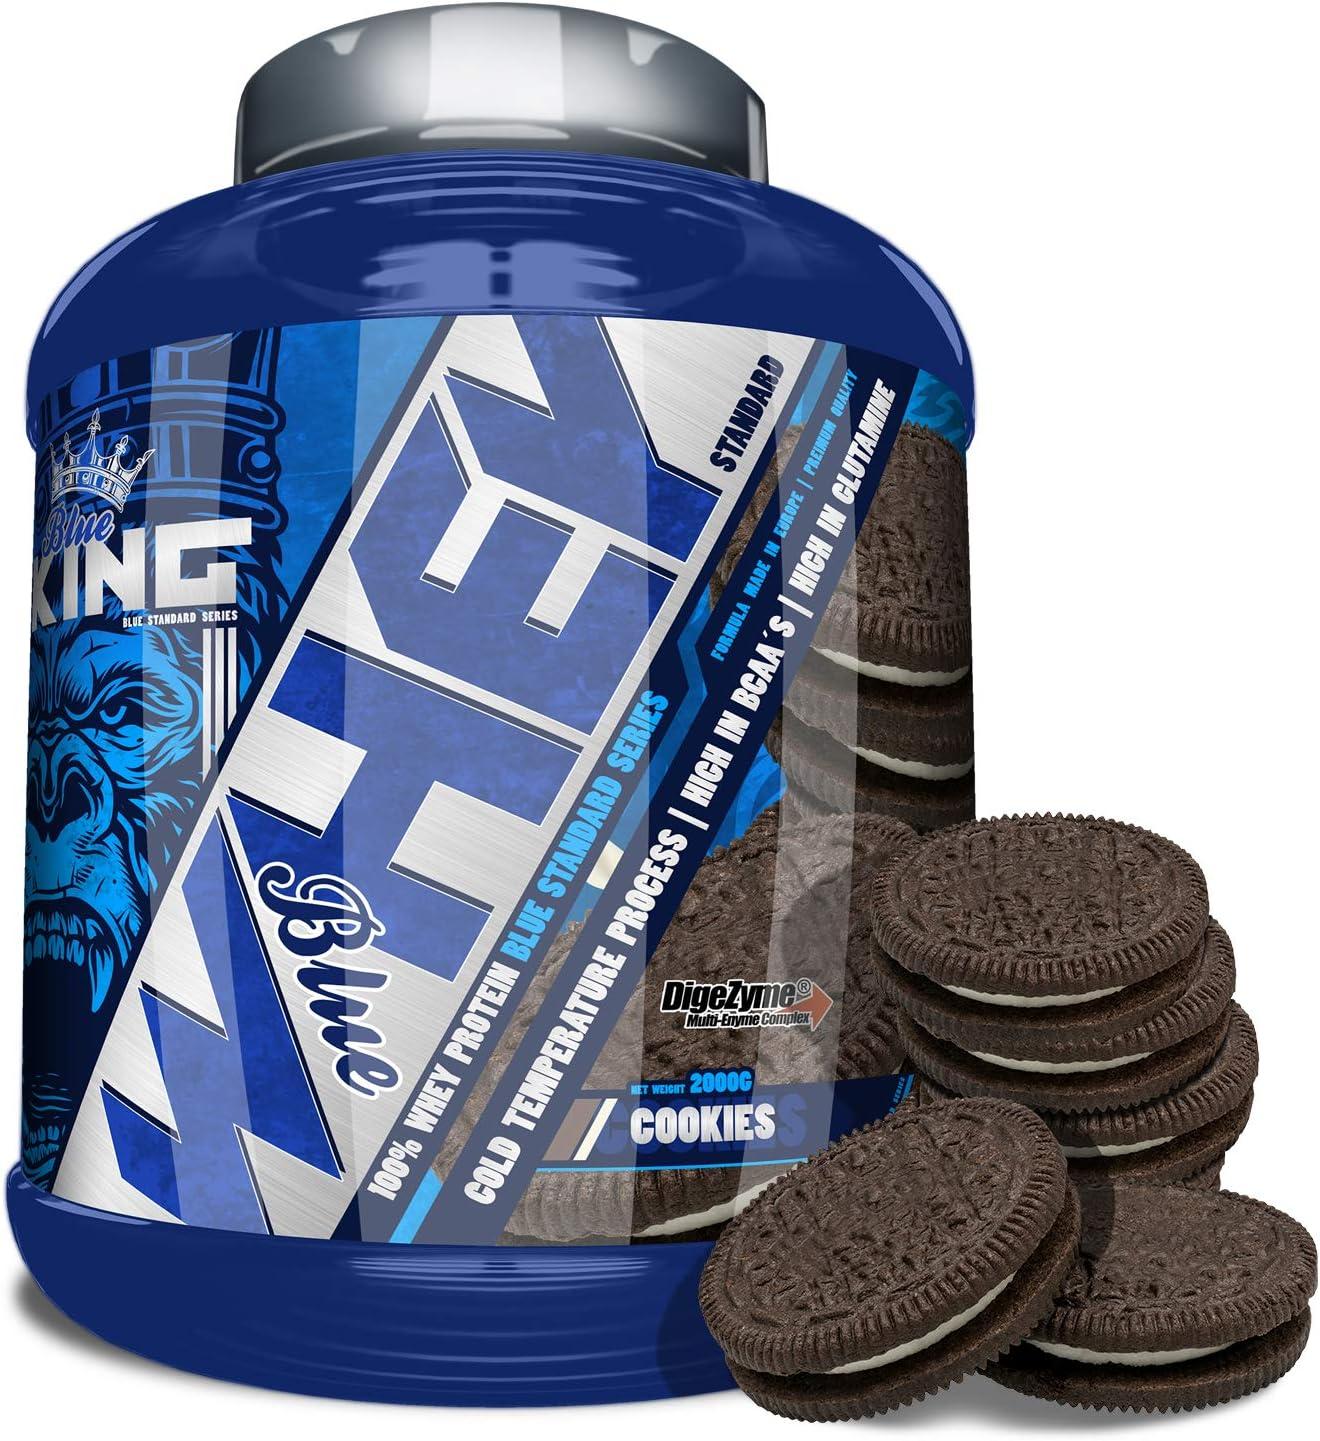 BLUEKING SUPPLEMENT, Whey Protein, Proteína en polvo, Suplementos deportivos, American Blue - 2kg (COOKIES)